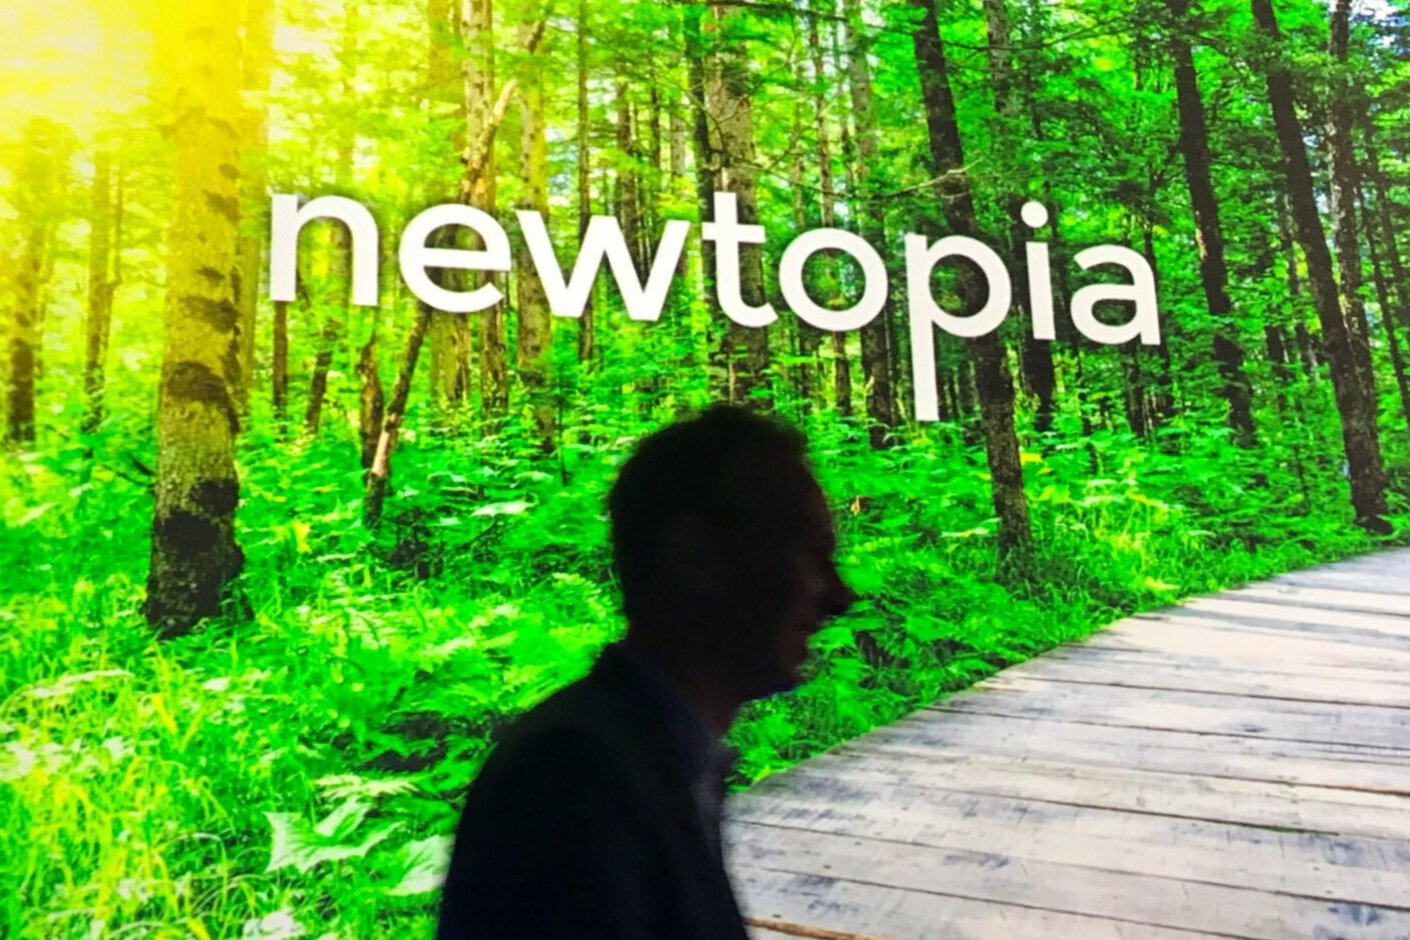 Newtopia+-+CEO+Silhouette+and+Slide_4145.jpg